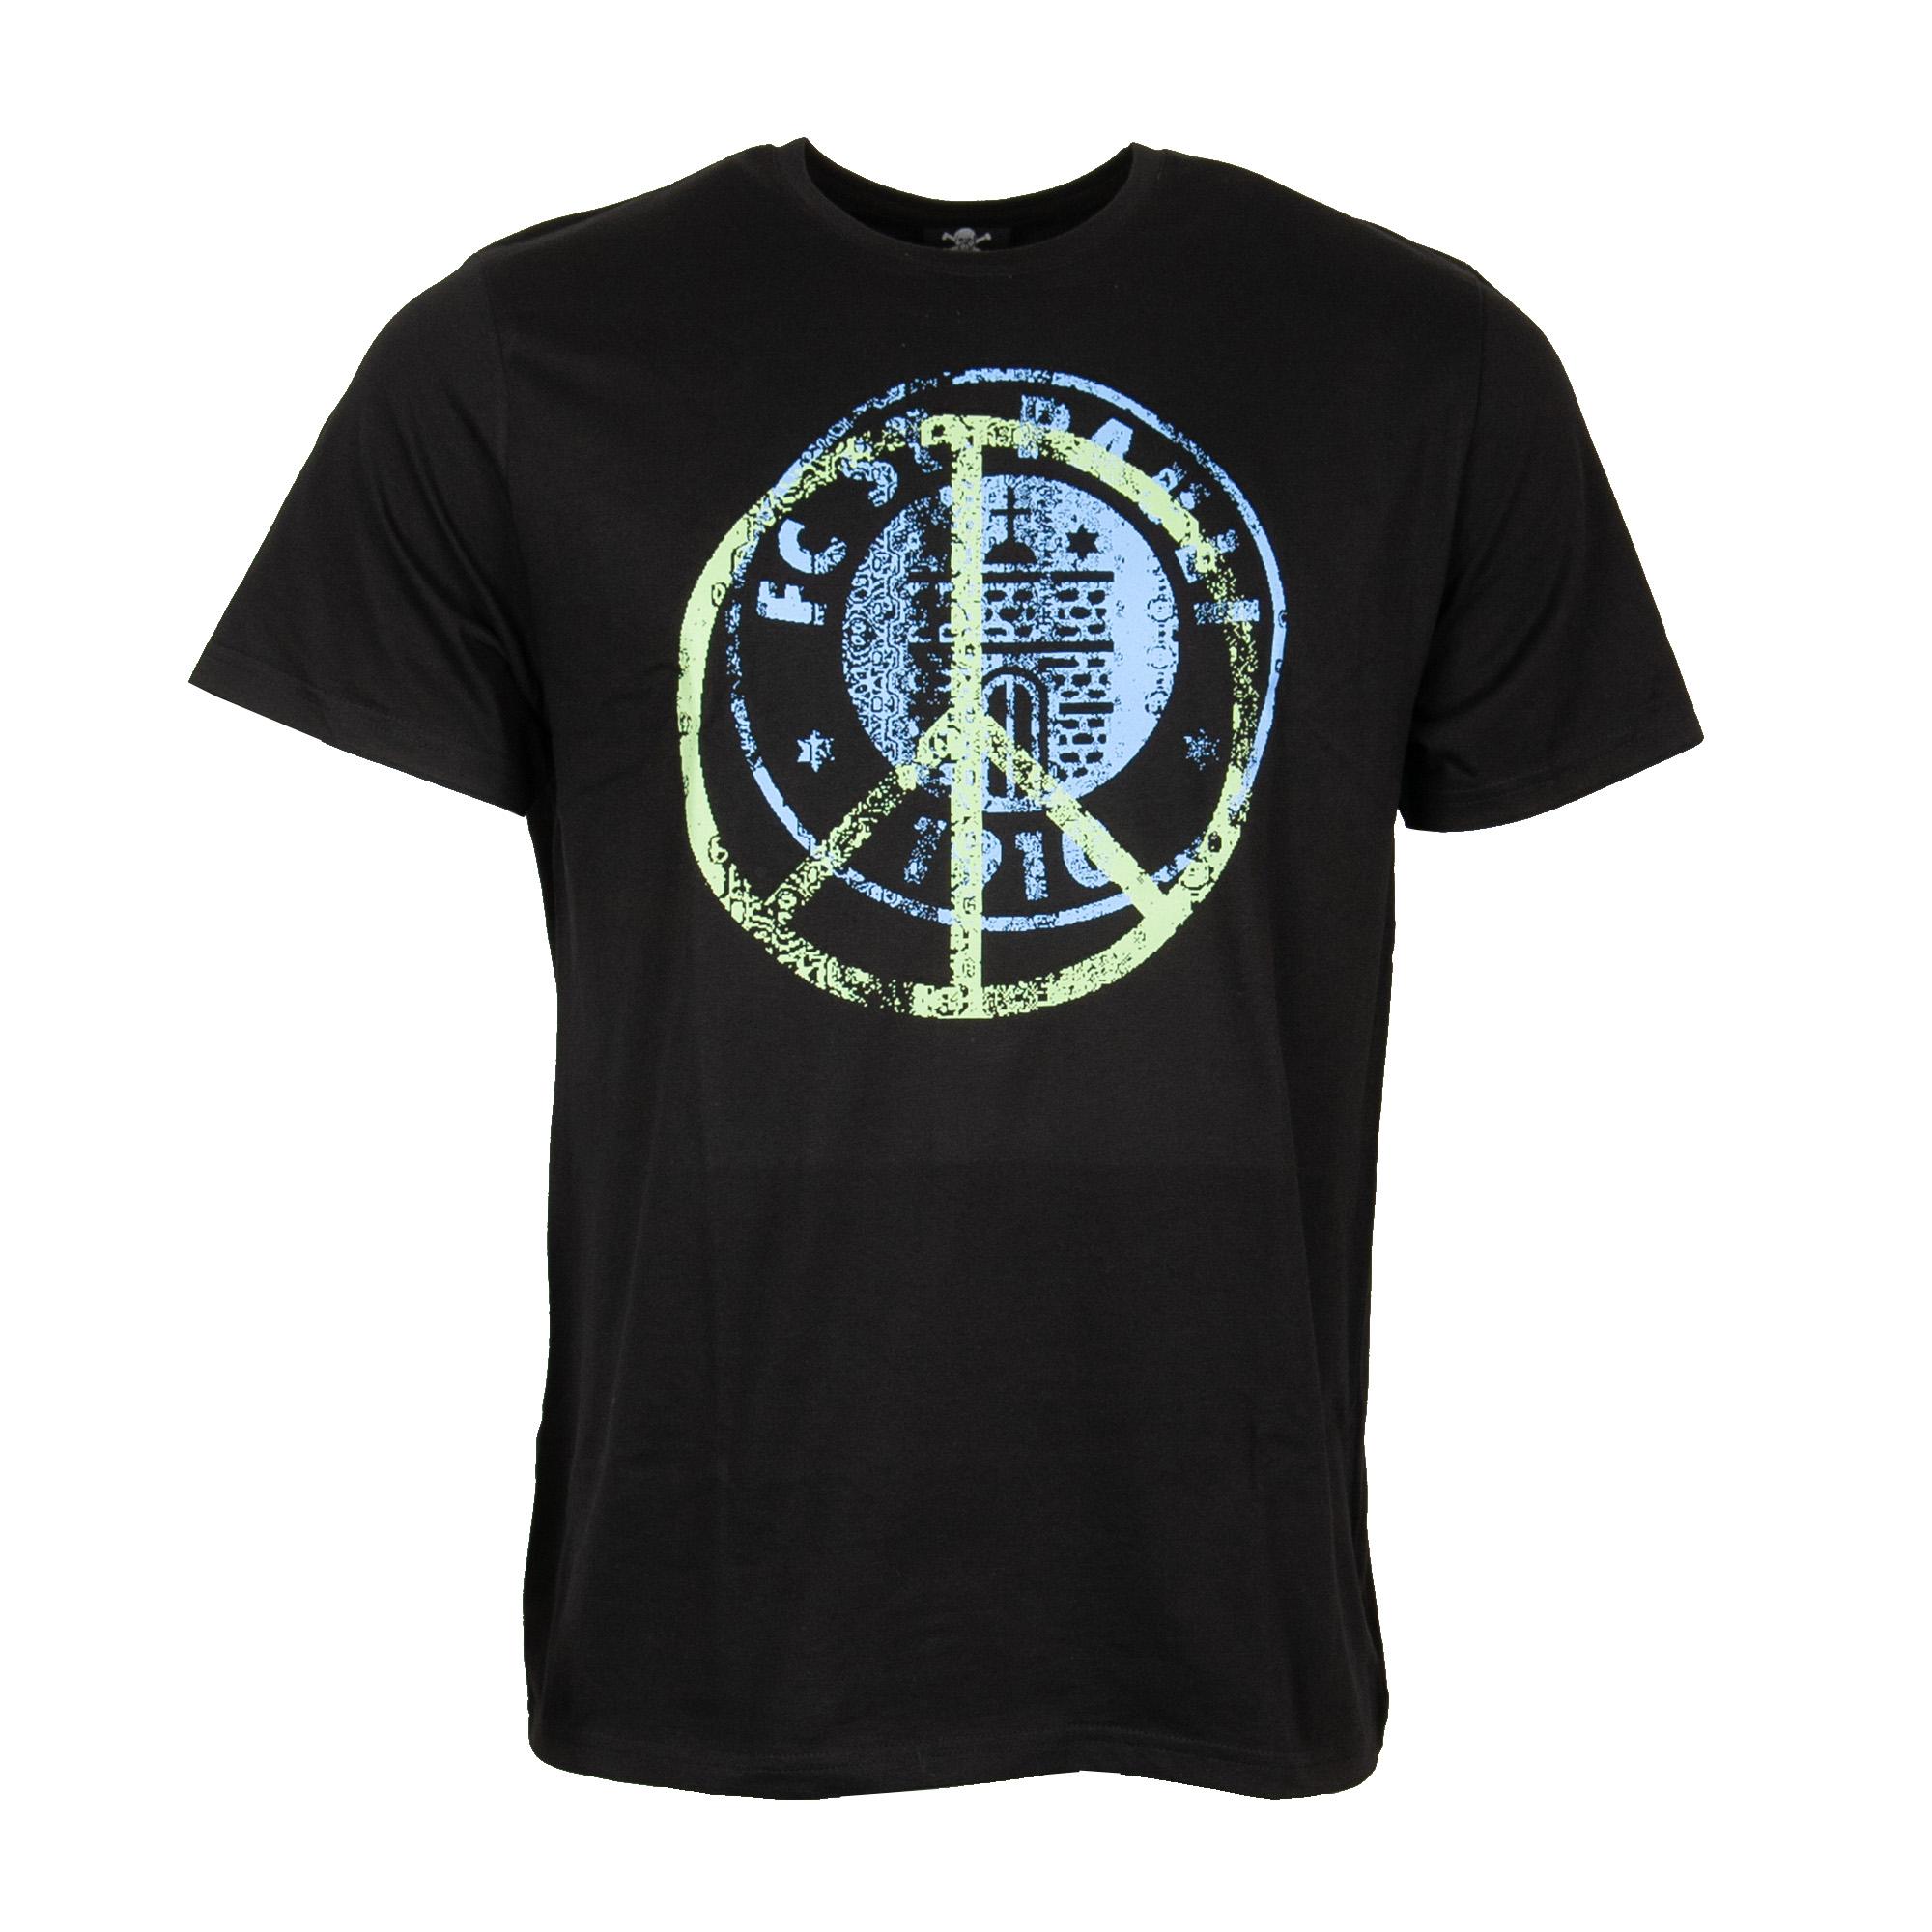 FC St. Pauli - T-Shirt Peace Blau-Grün - schwarz